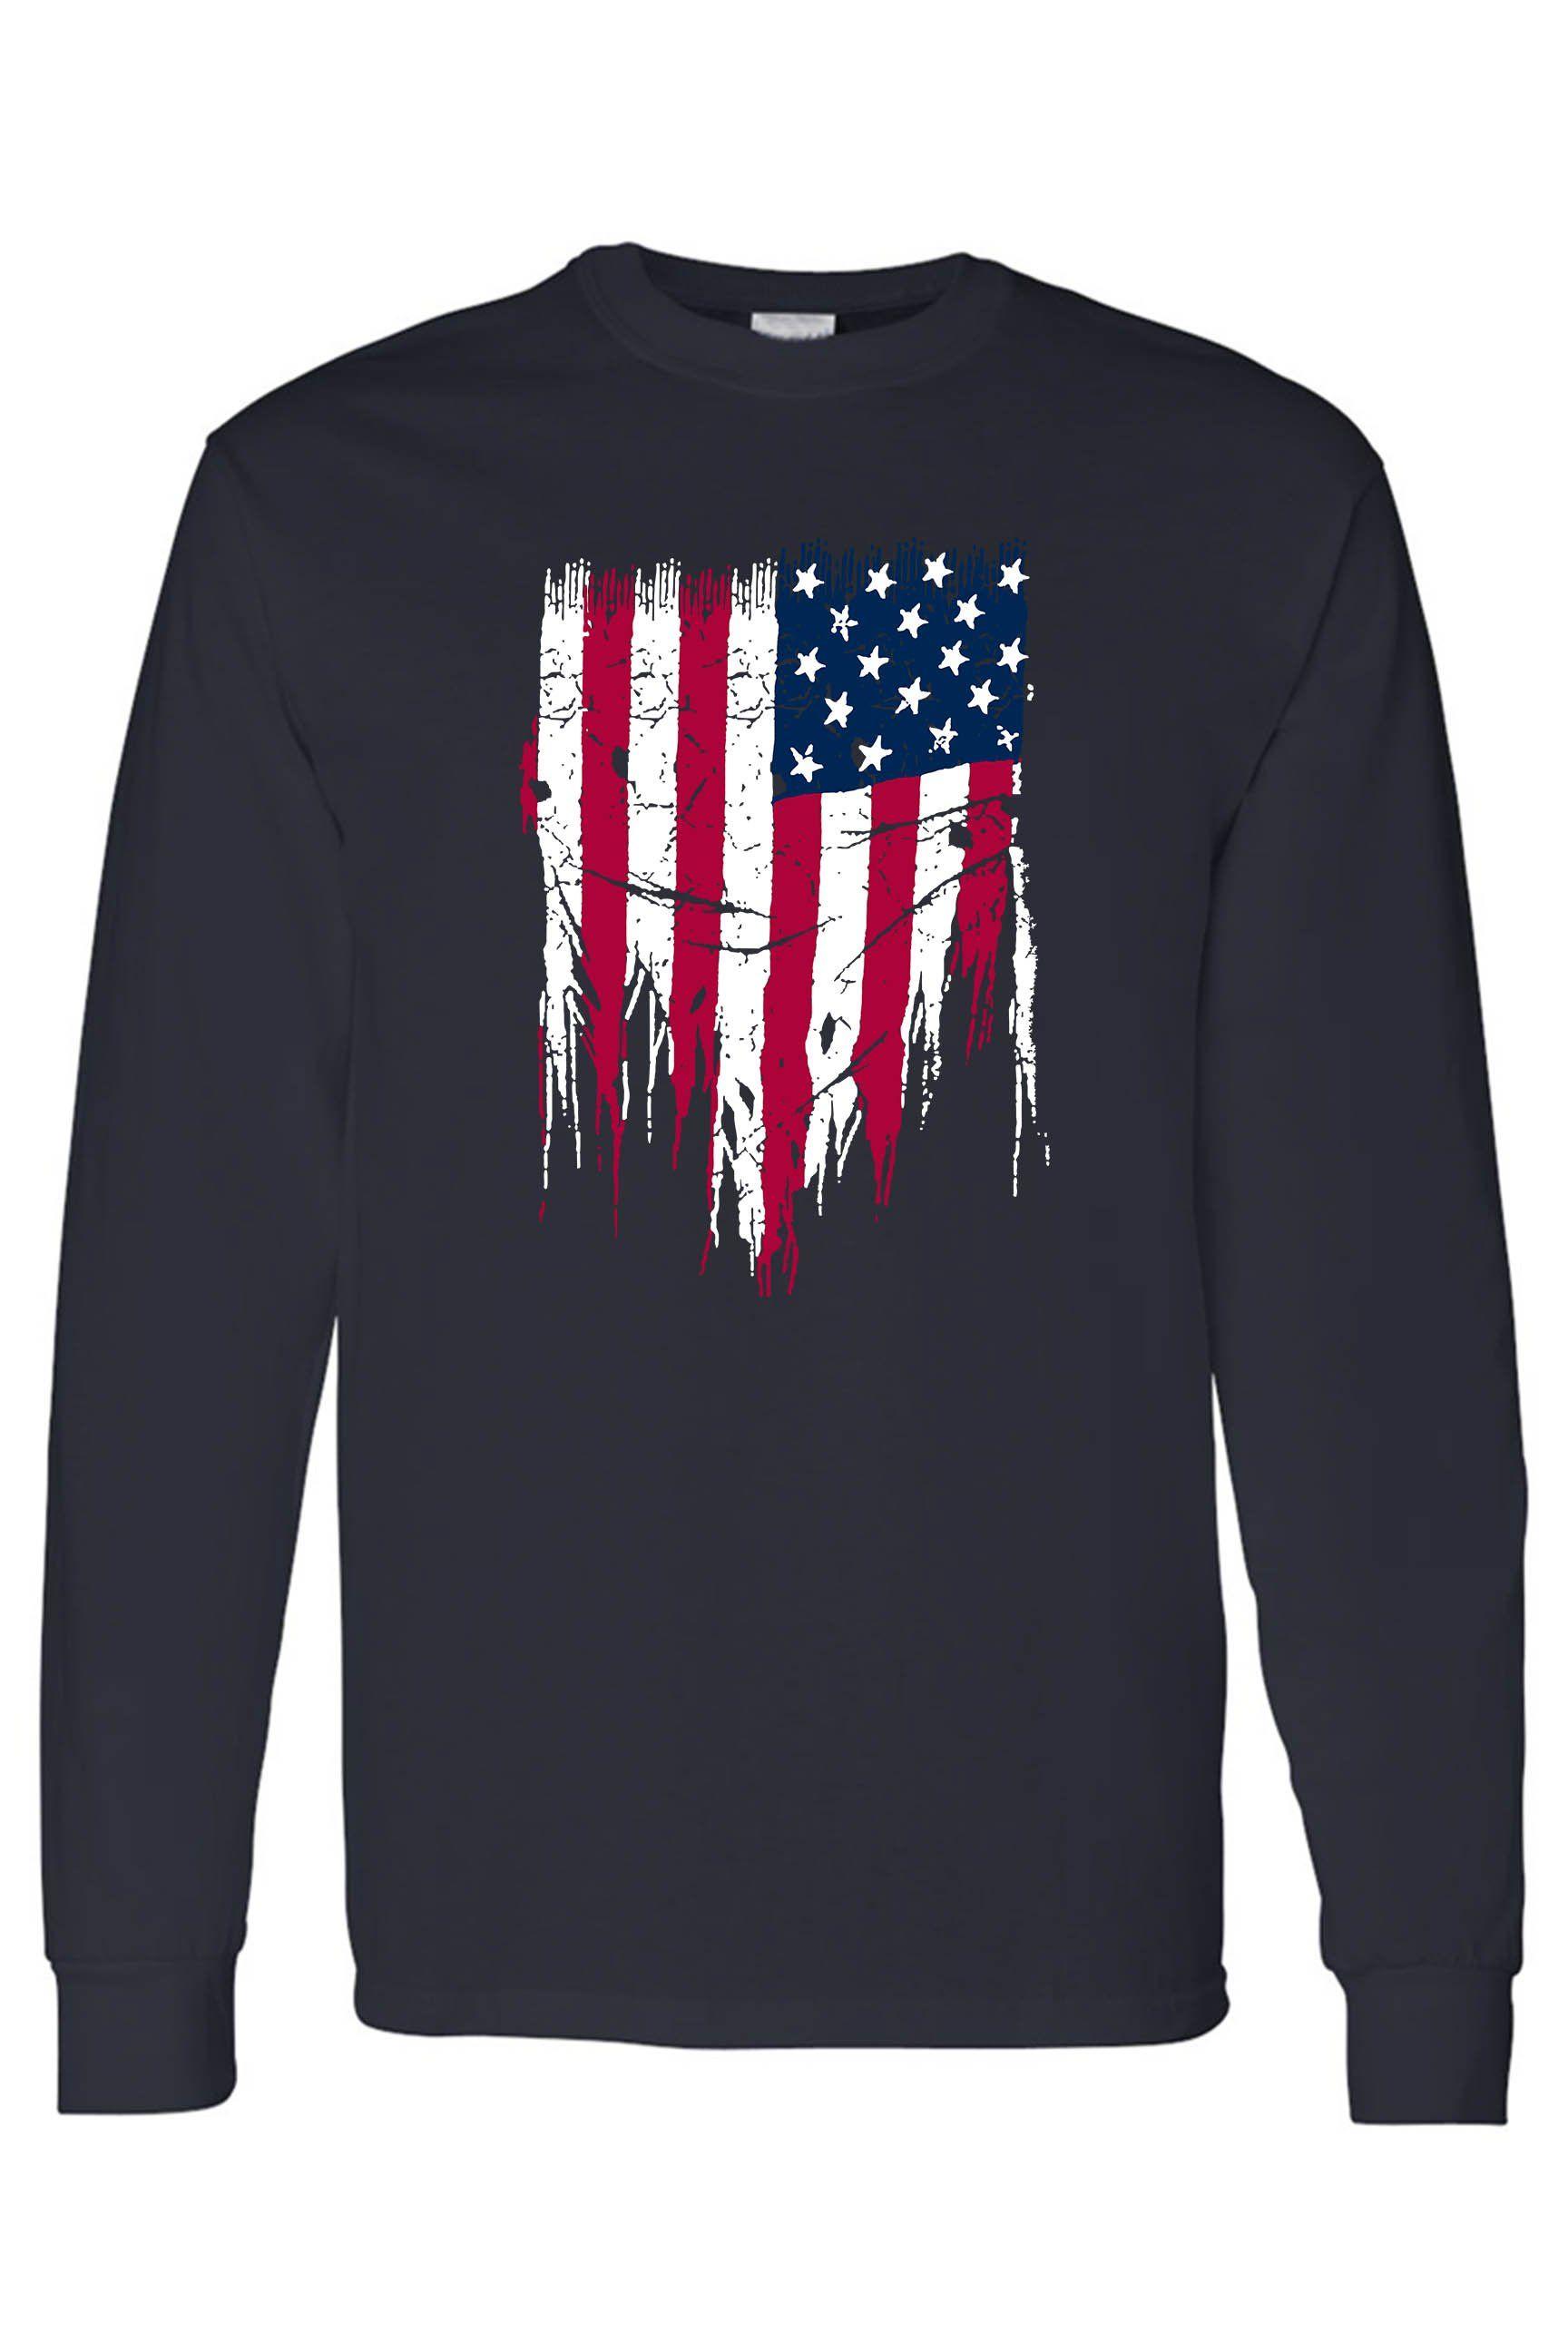 Men's/Unisex USA Flag Battle Ripped Long Sleeve T-Shirt – NAVY / Large